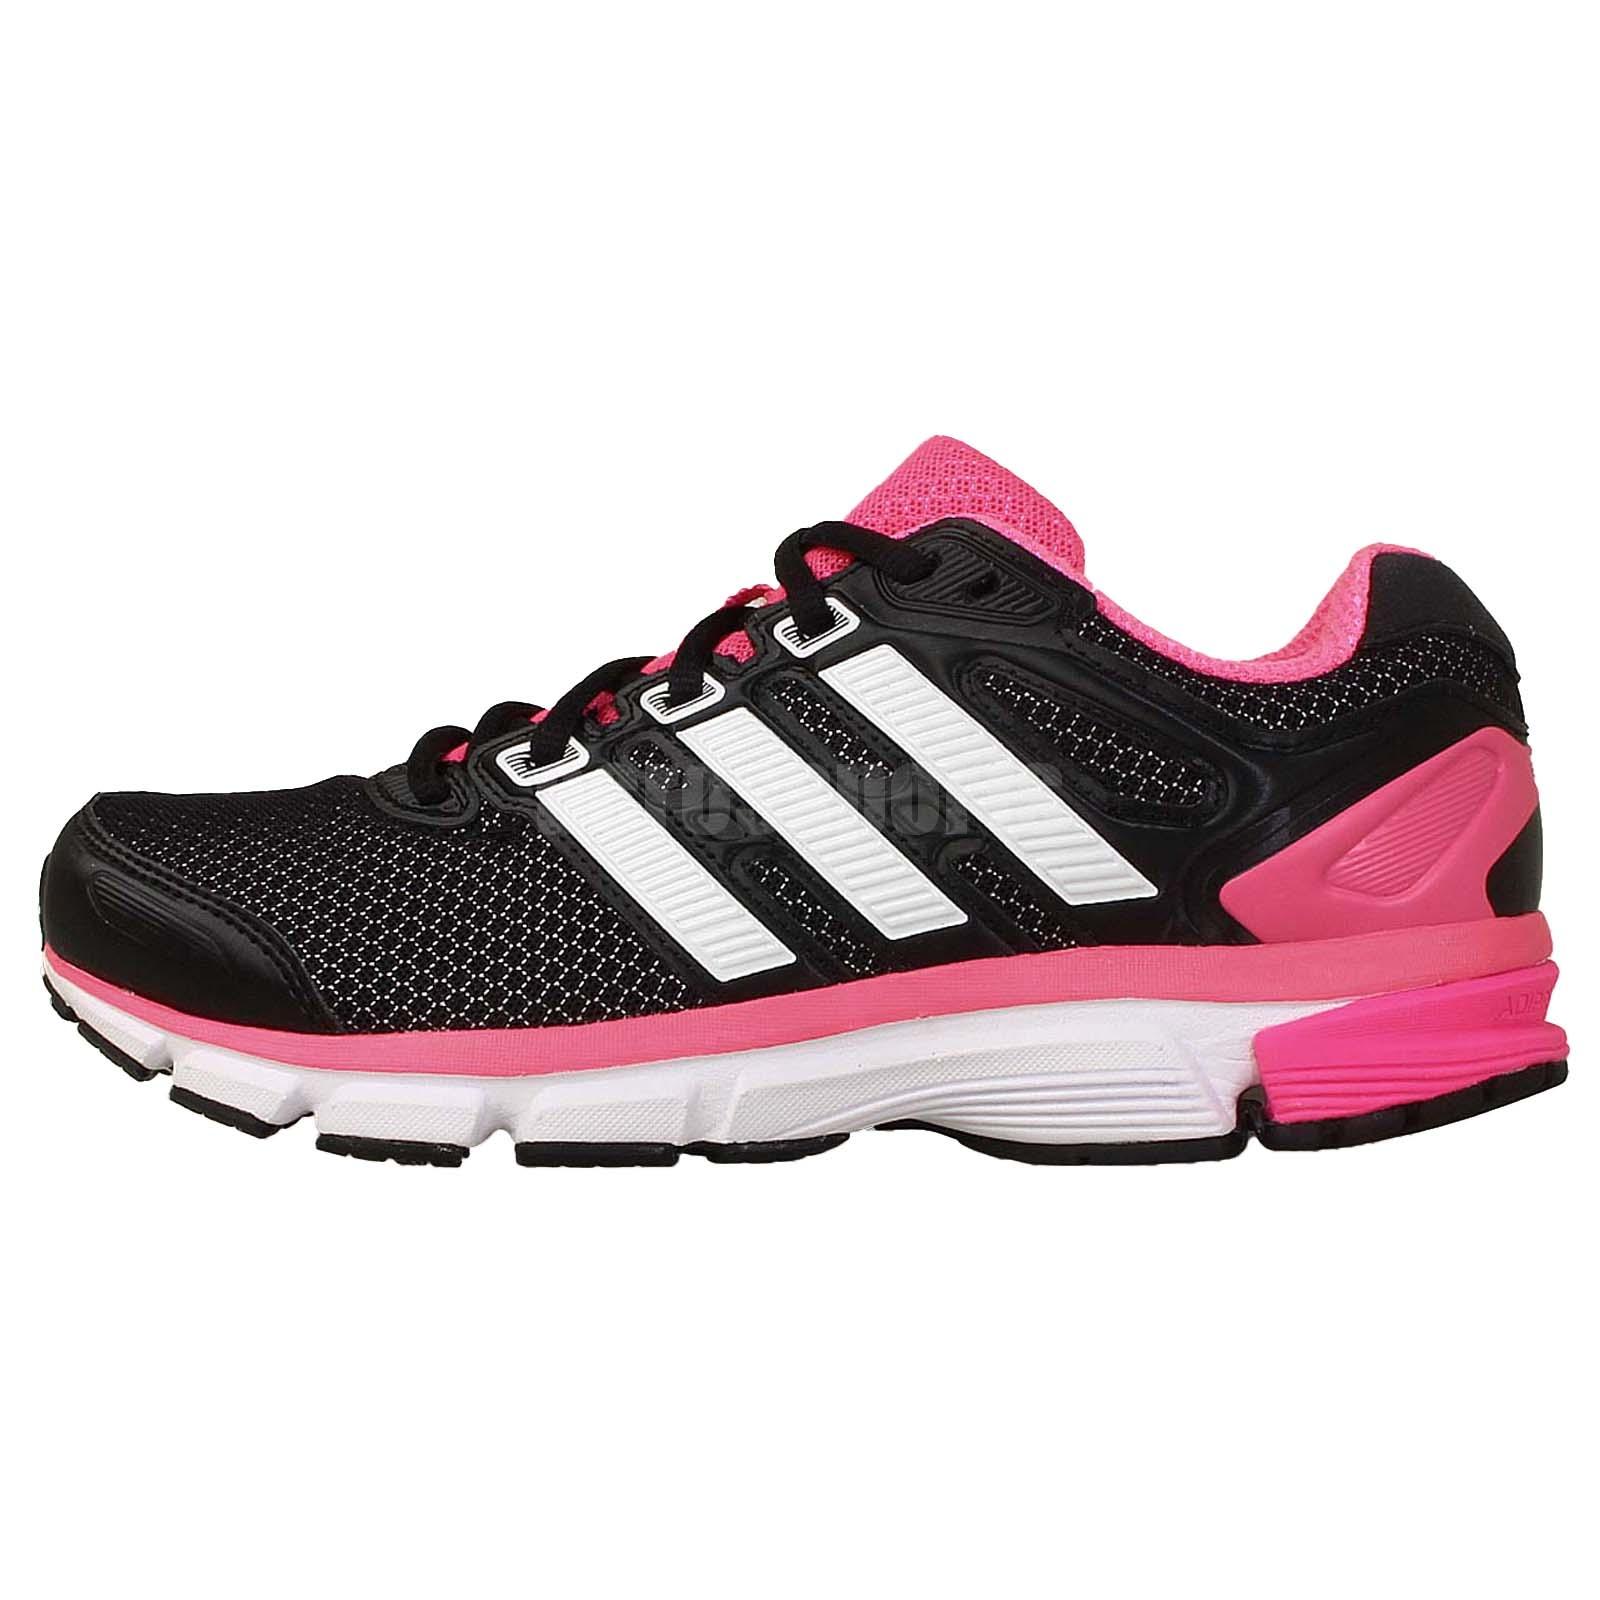 adidas nova stability w black white pink 2014 womens